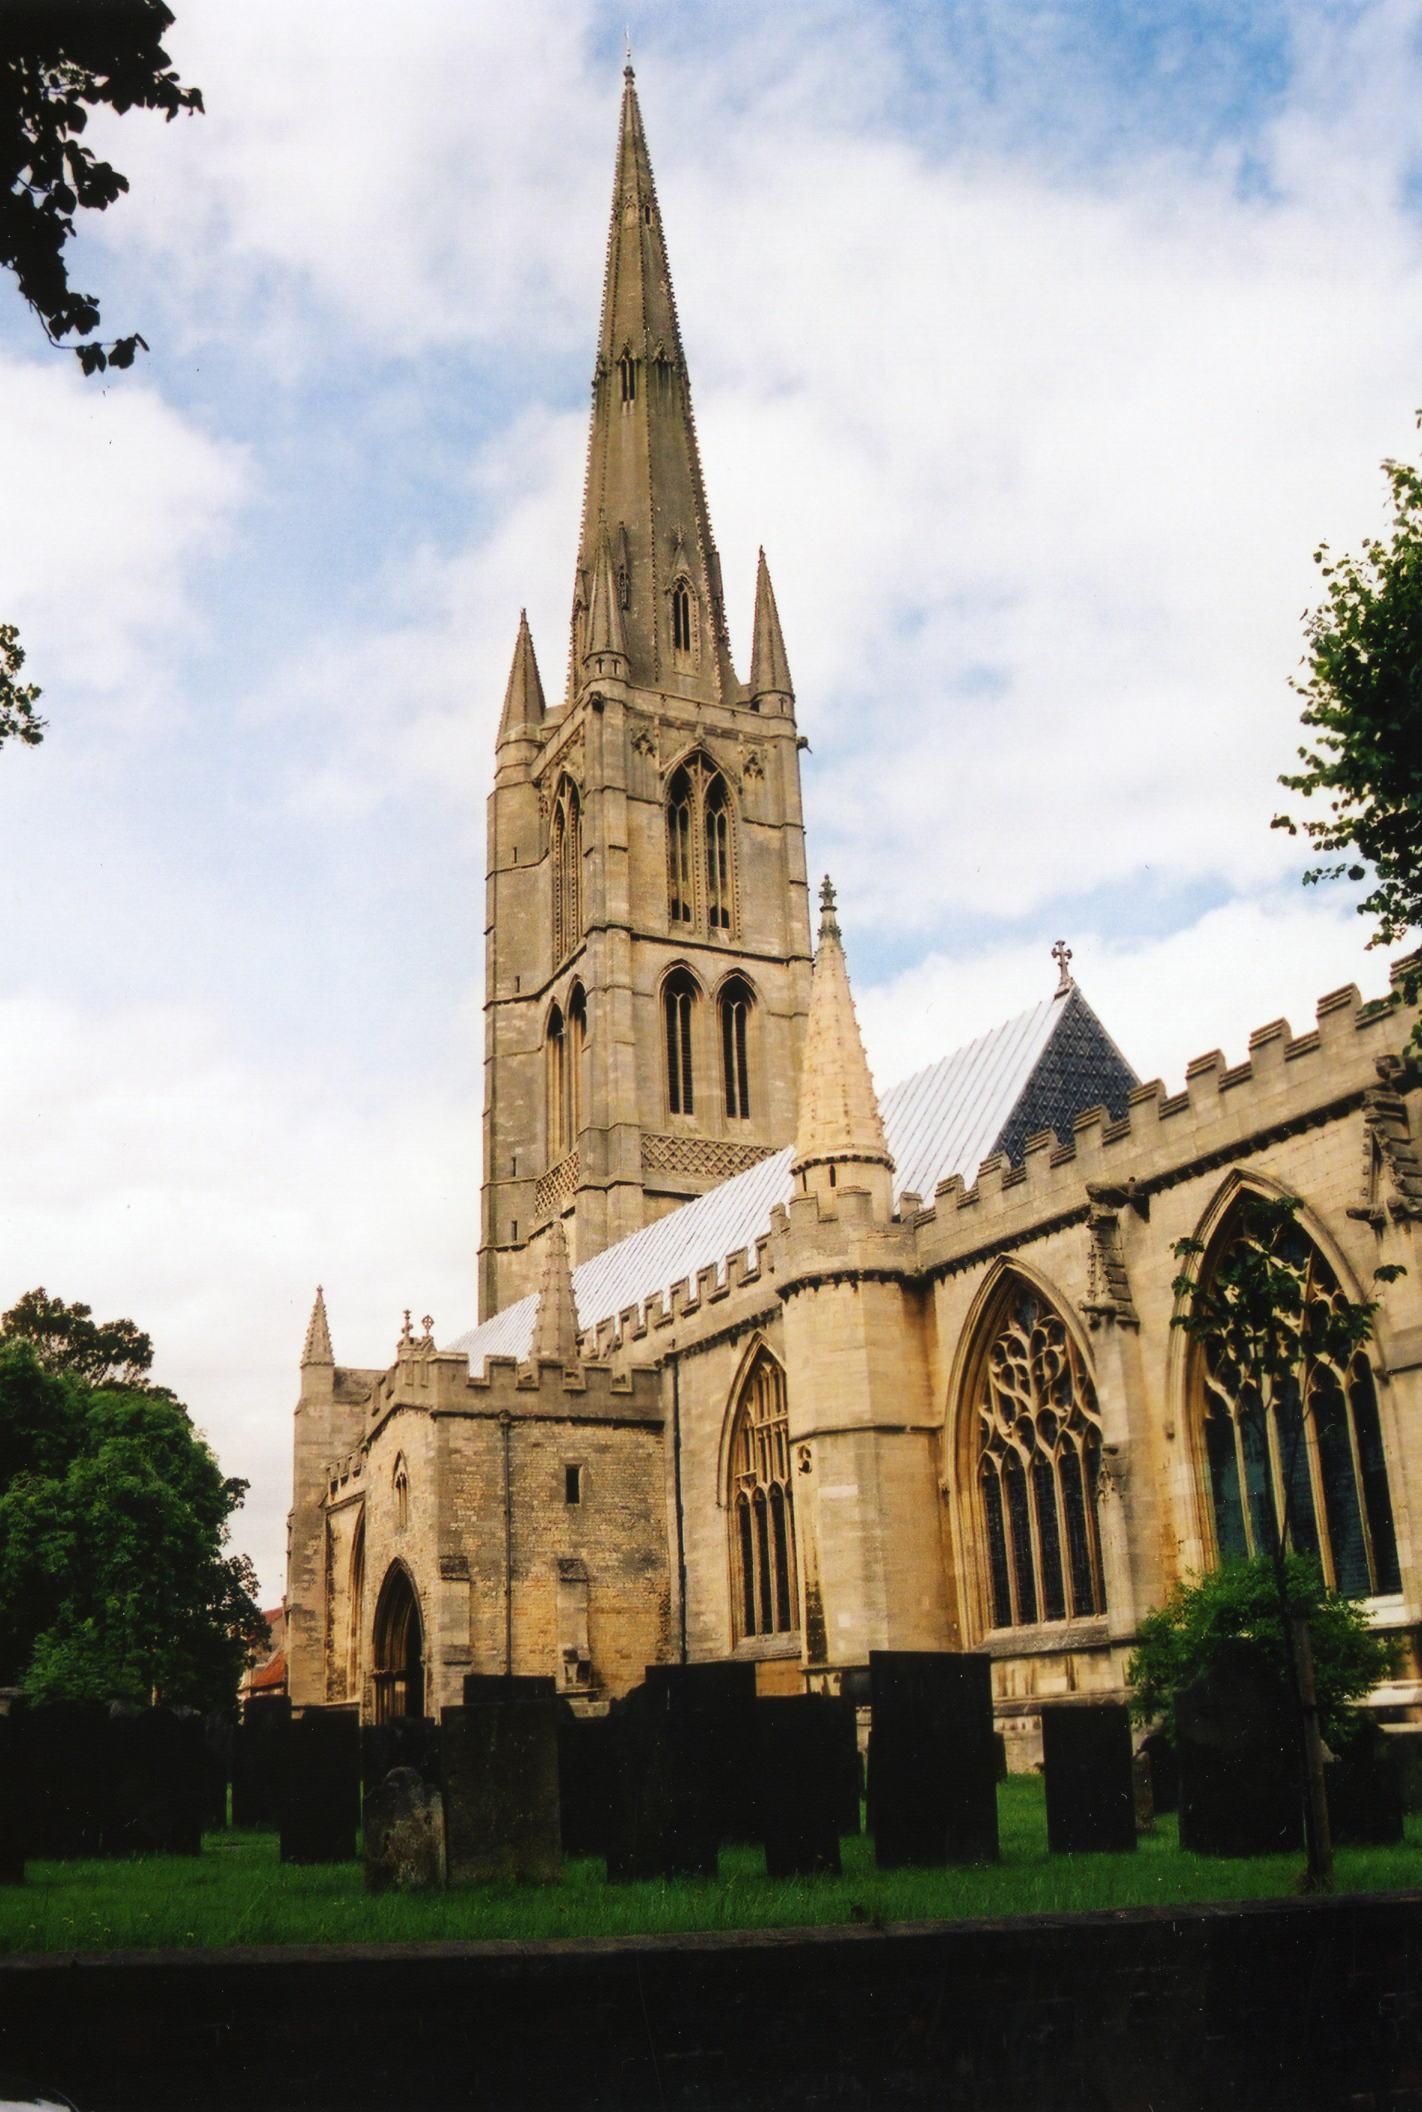 Saint Wulfram's church